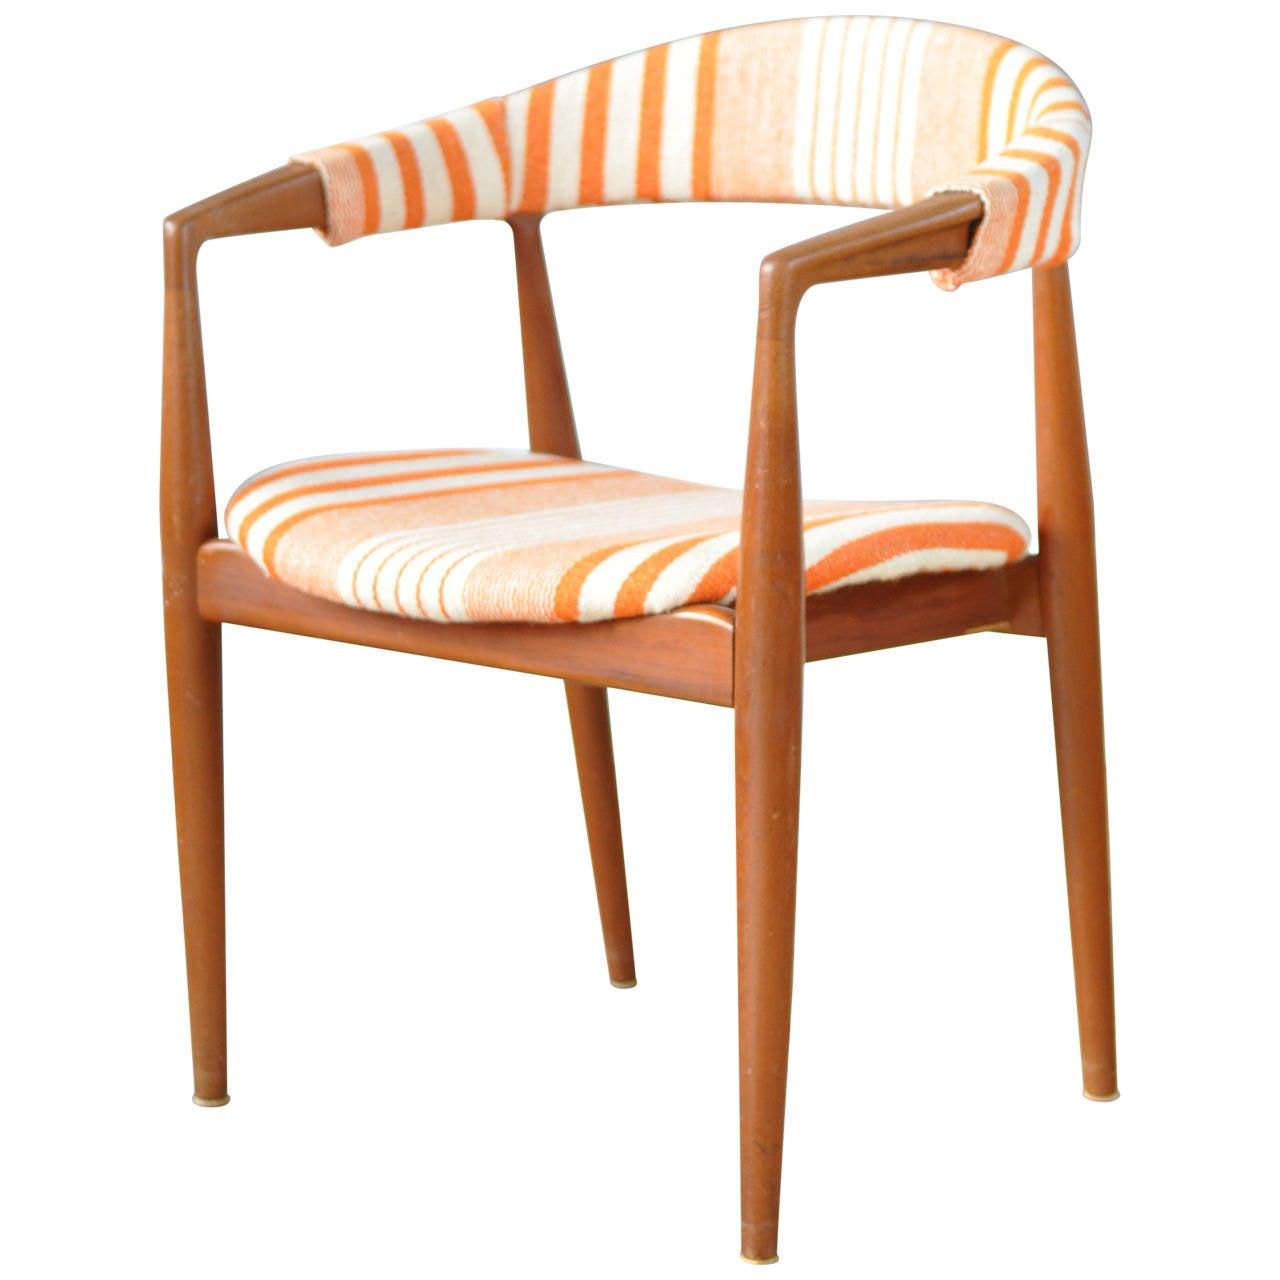 Danish occasional chair by kai kristiansen at 1stdibs - Kai kristiansen chair ...